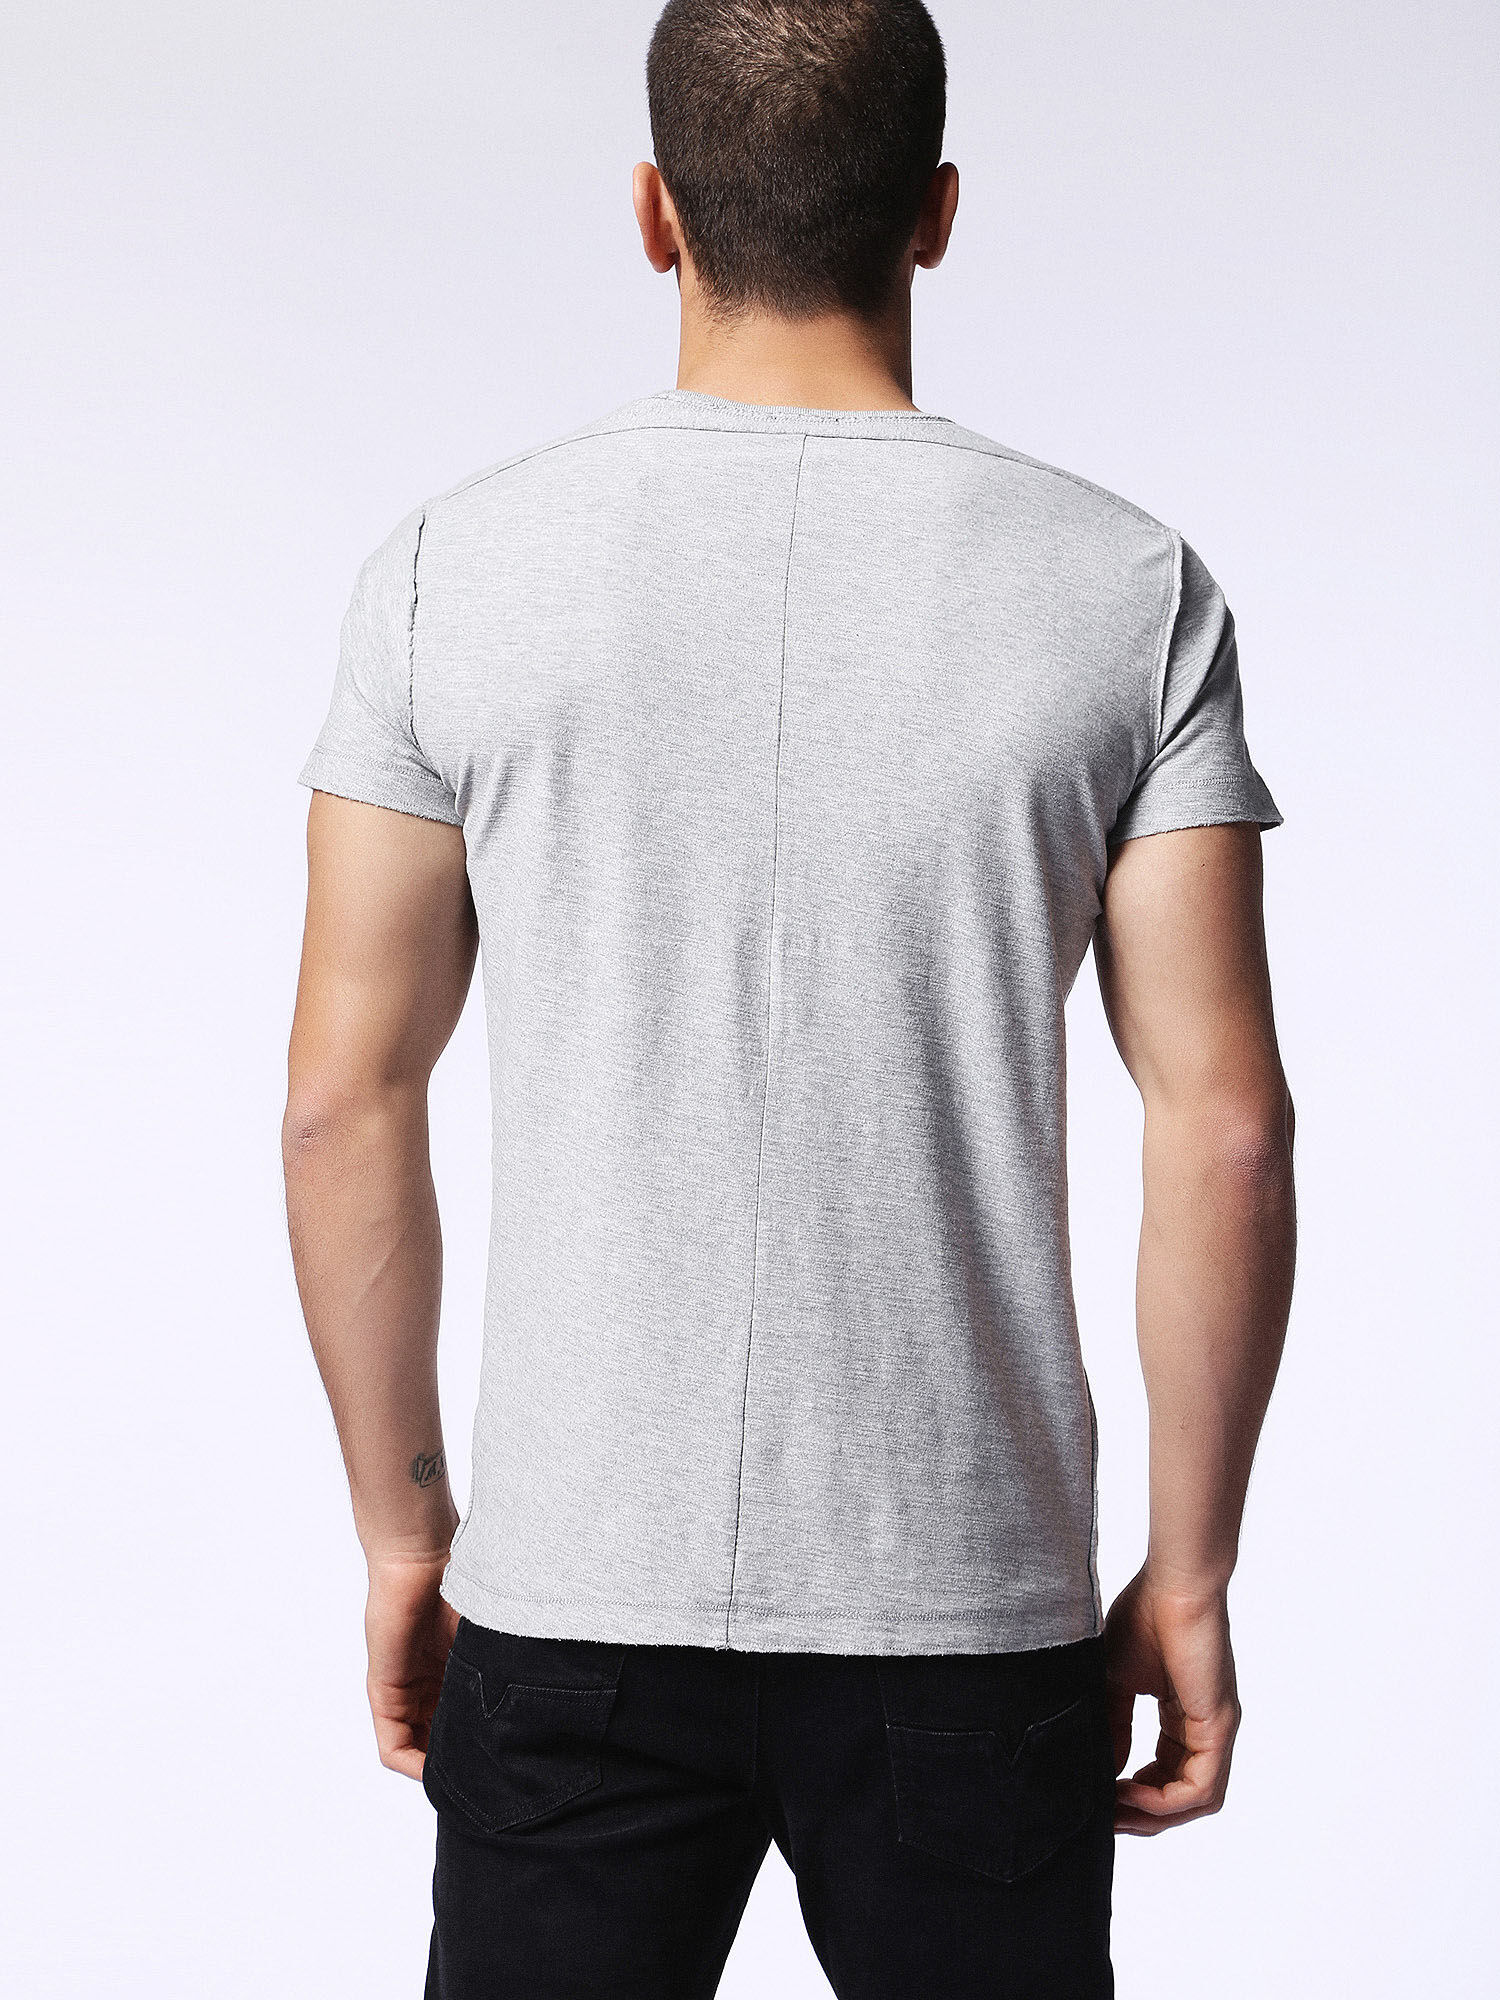 00SRFL00KDY T-Shirts Man T-KNAK by Diesel Grey